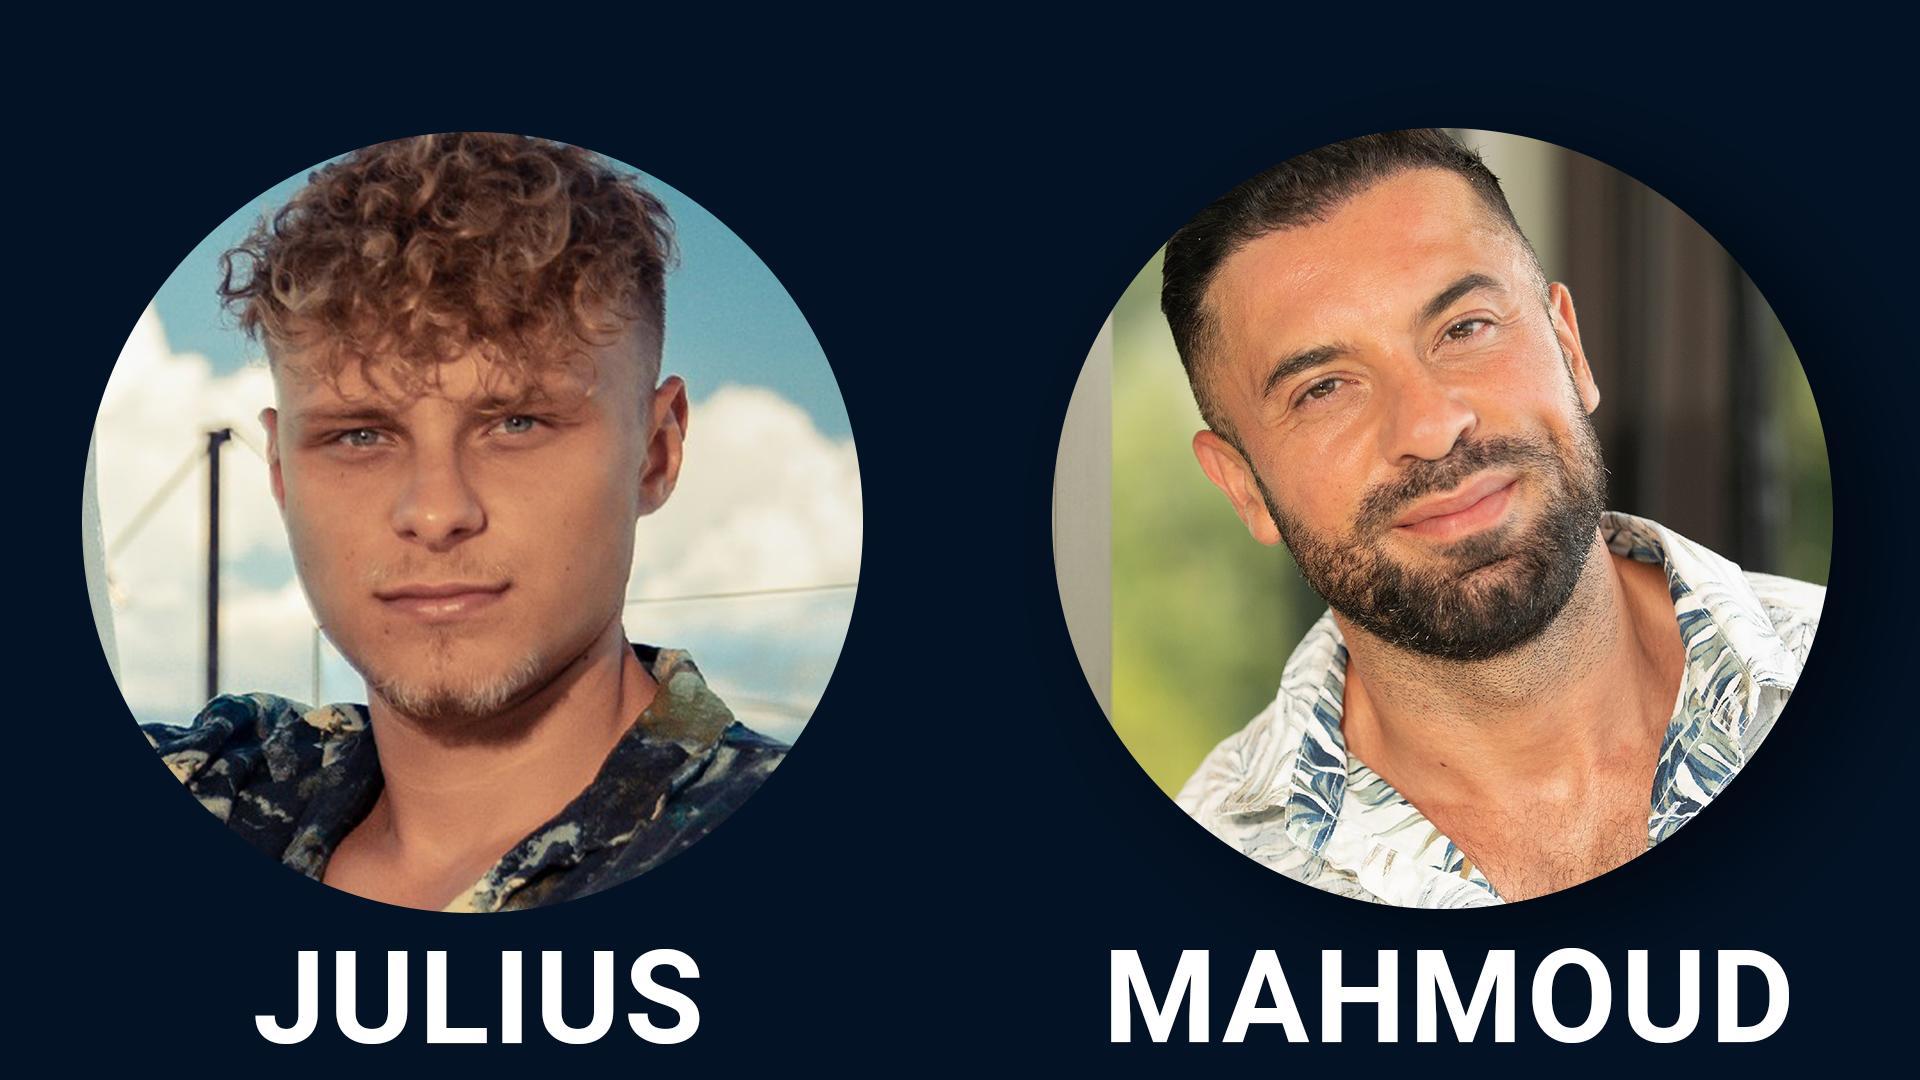 Julius + Mahmoud